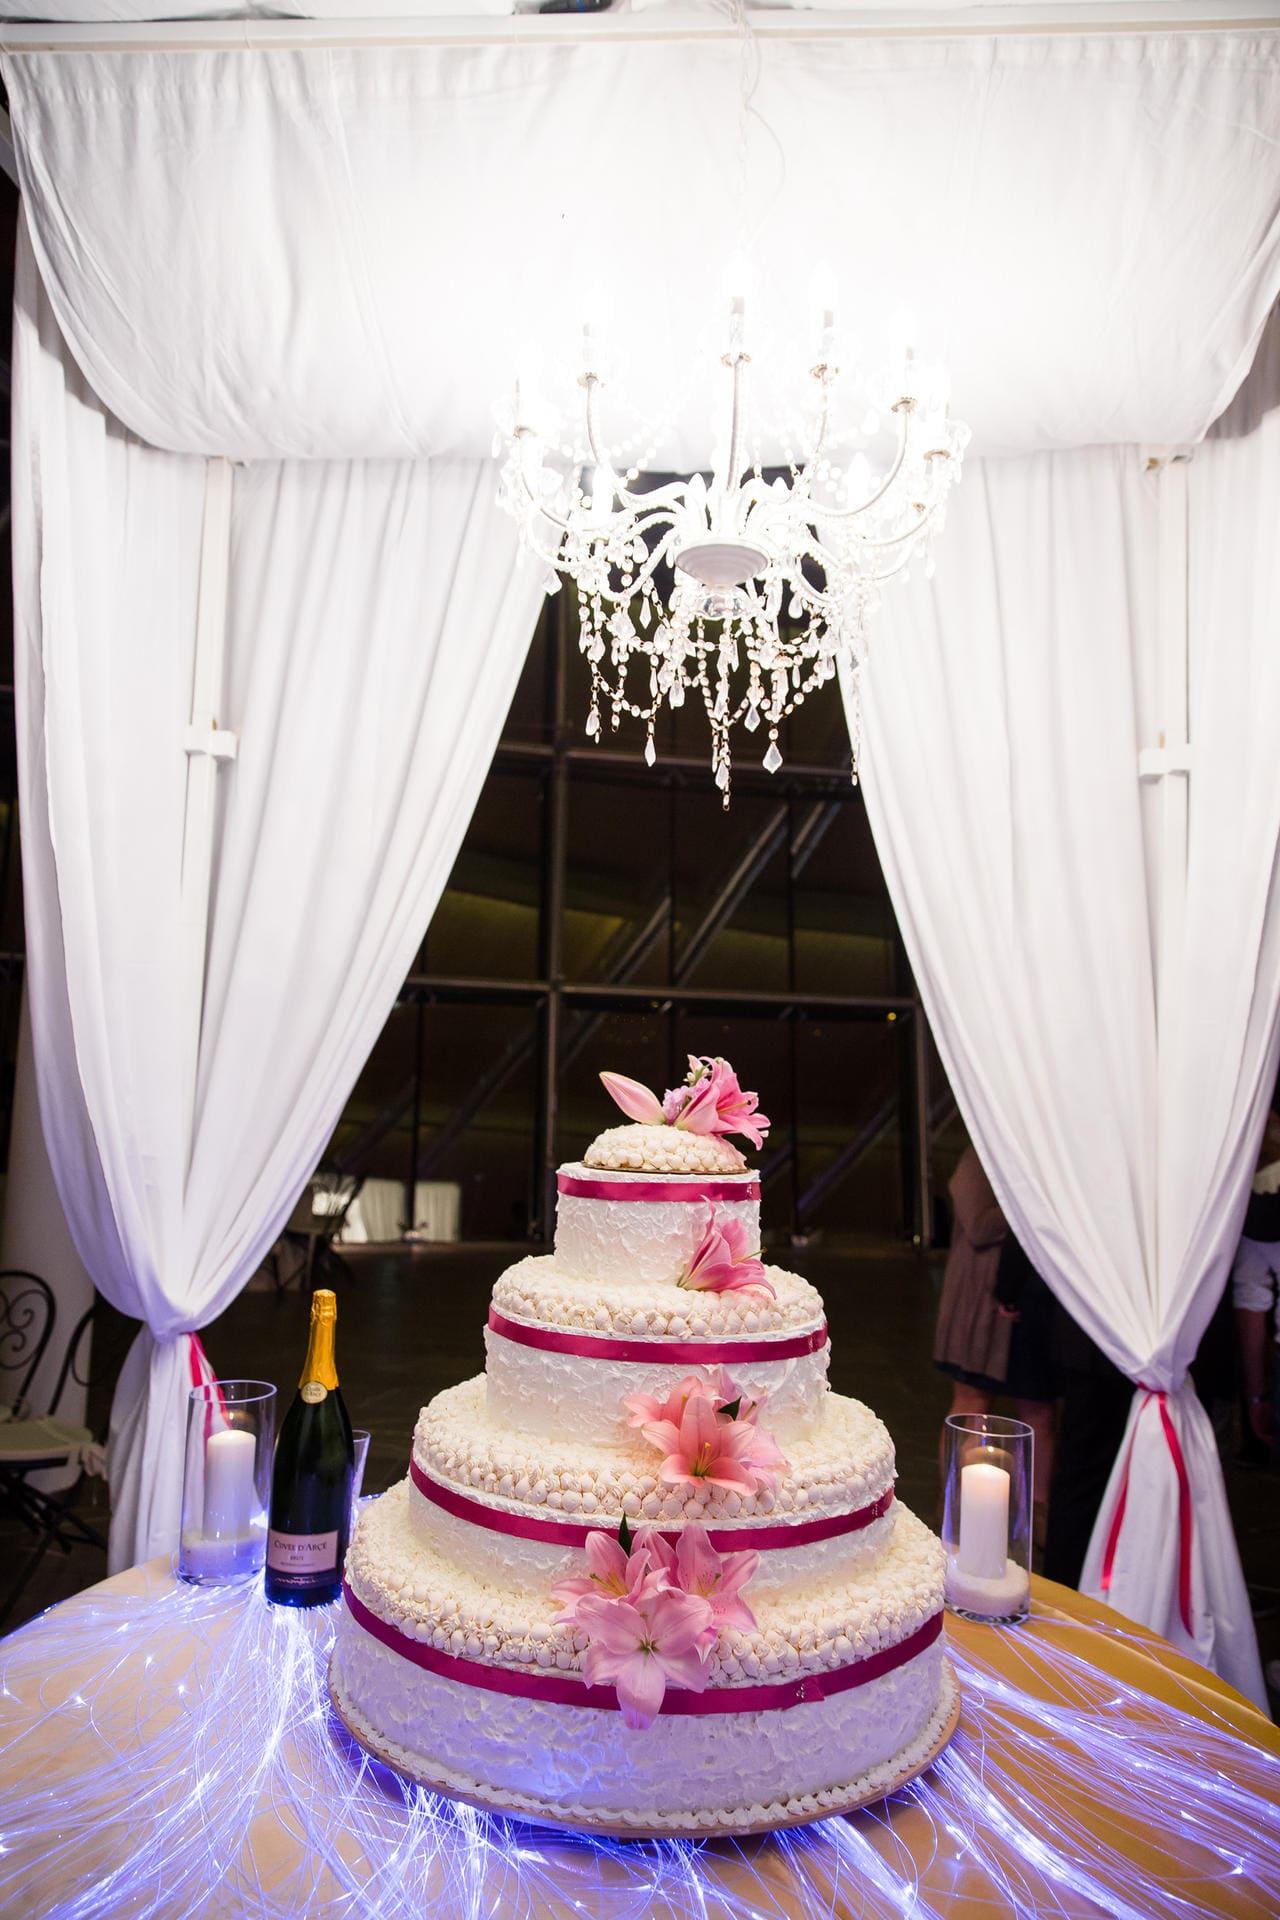 14.05.2016 - Wedding Cake